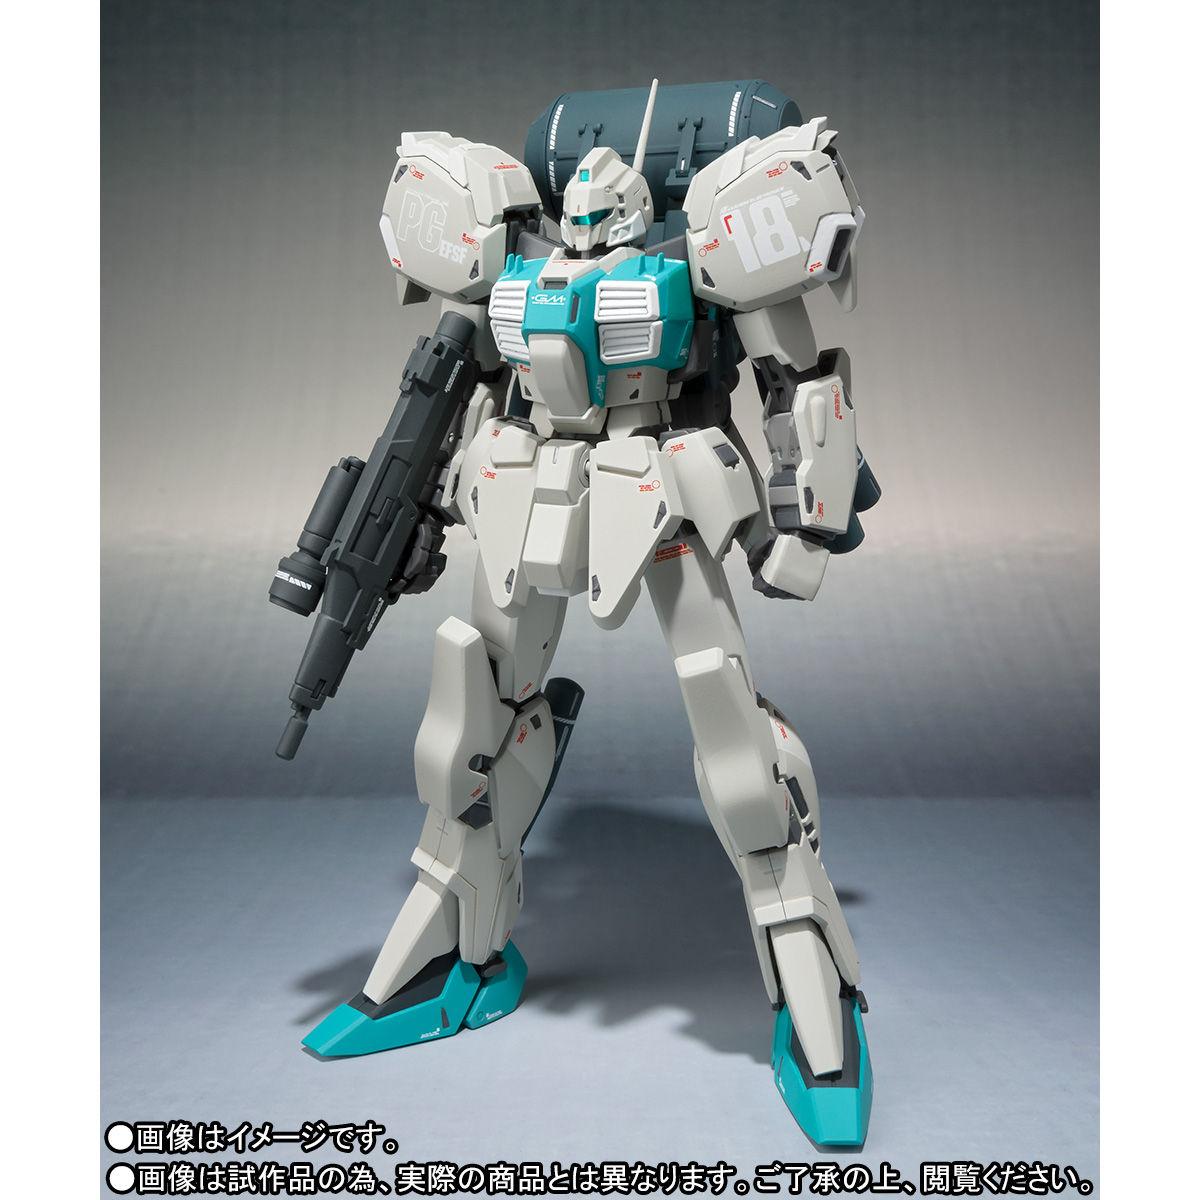 ROBOT魂(Ka signature)〈SIDE MS〉『ネロ(月面降下仕様)マーキングプラスVer.』ガンダム・センチネル 可動フィギュア-006